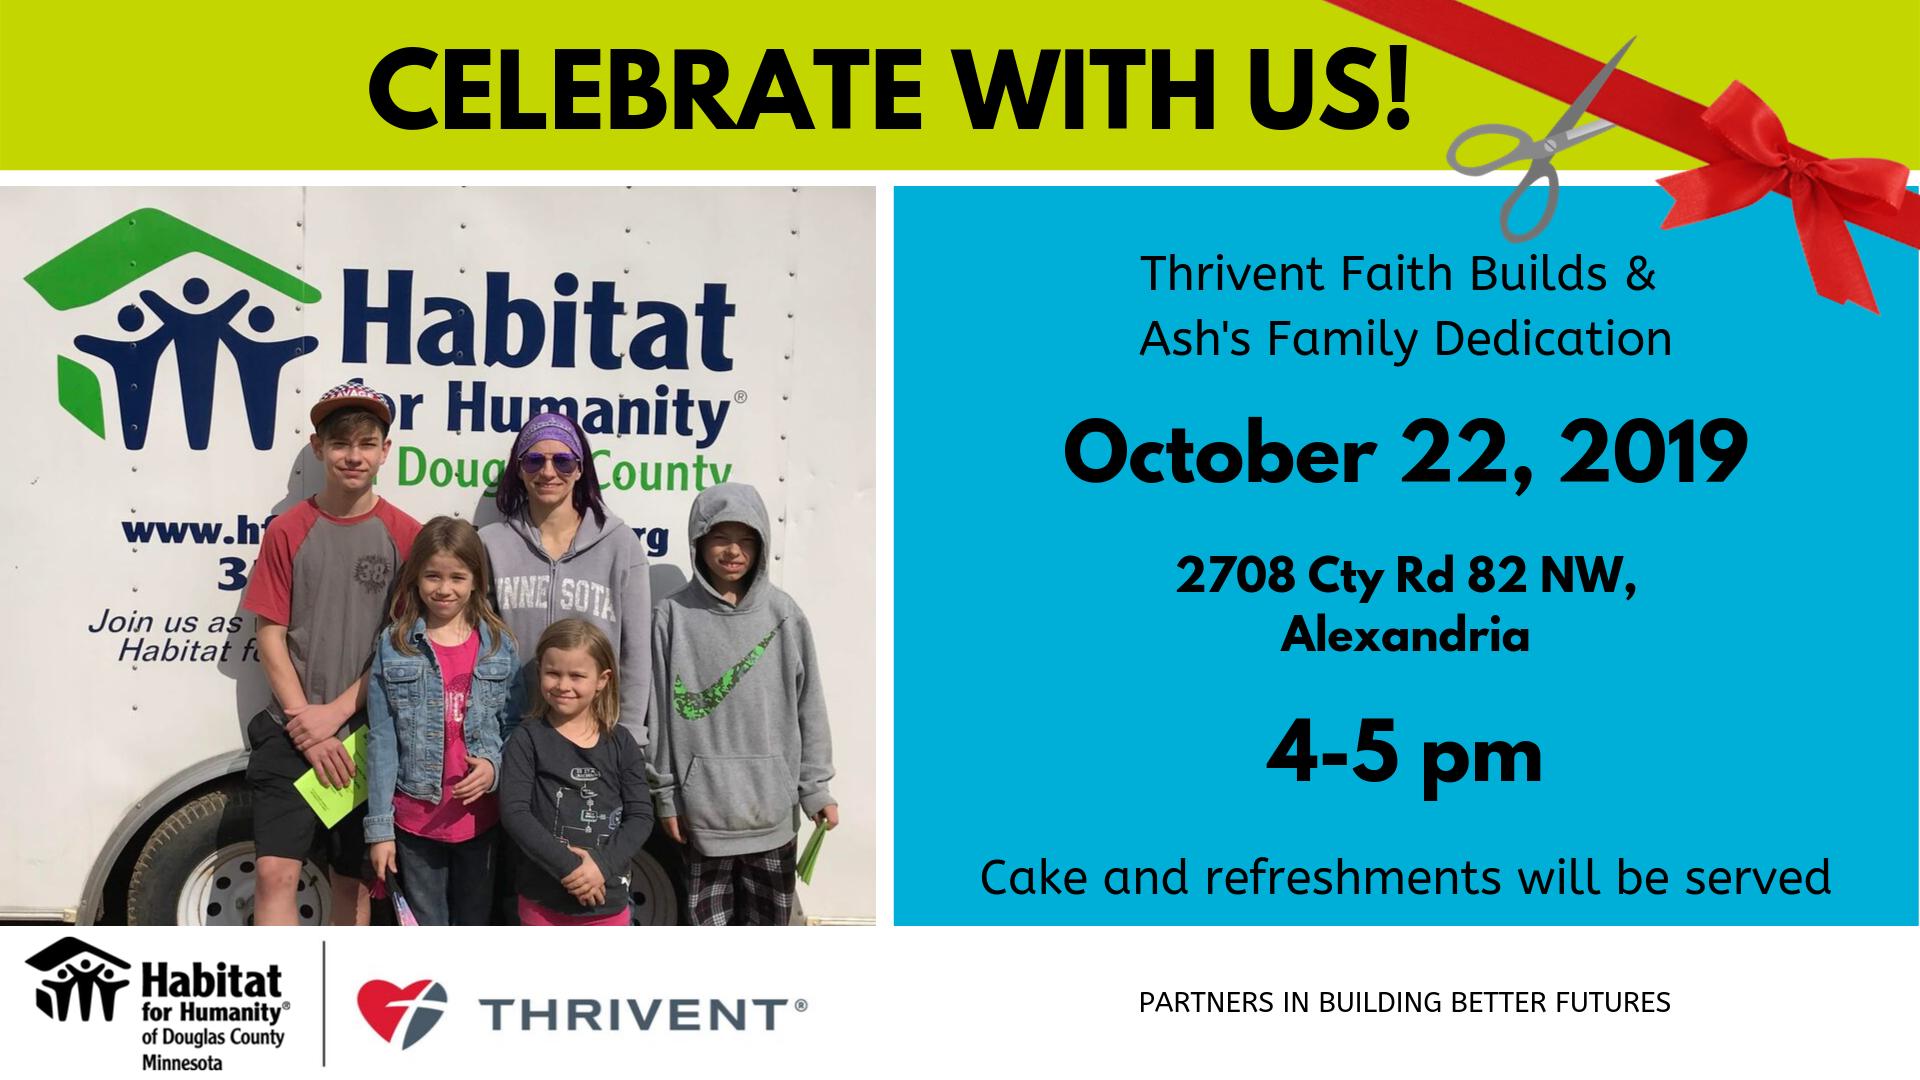 Thrivent Faith Builds Dedication for Ash's Family - October 22, 20190